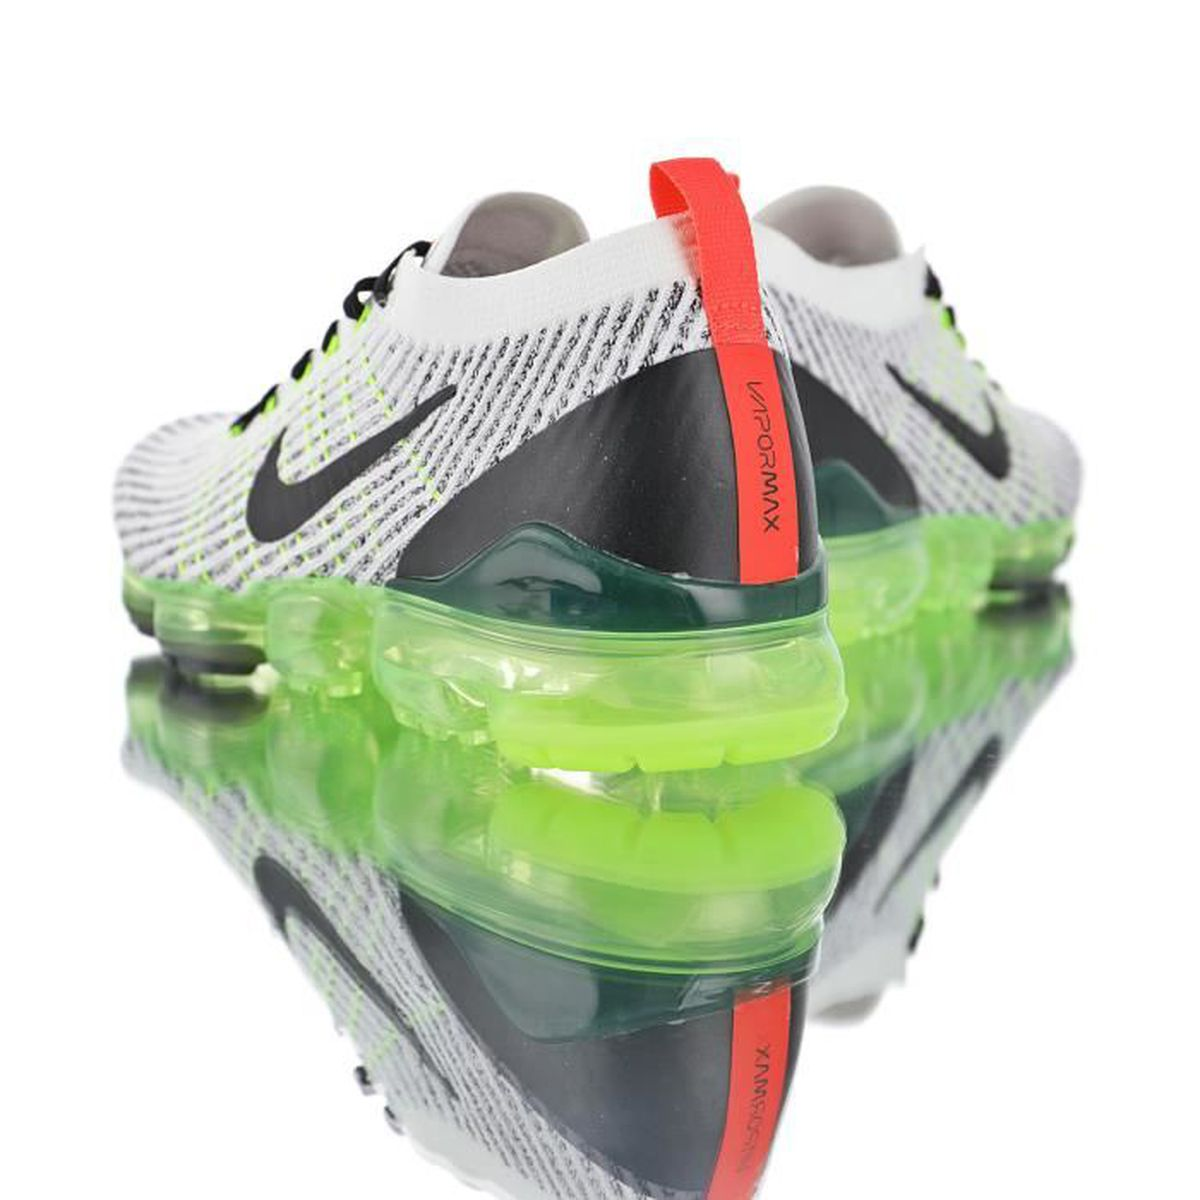 best sneakers official supplier classic shoes Baskets Nike Air VaporMax Flyknit W 3.0 Gris Vert Homme et Femme ...